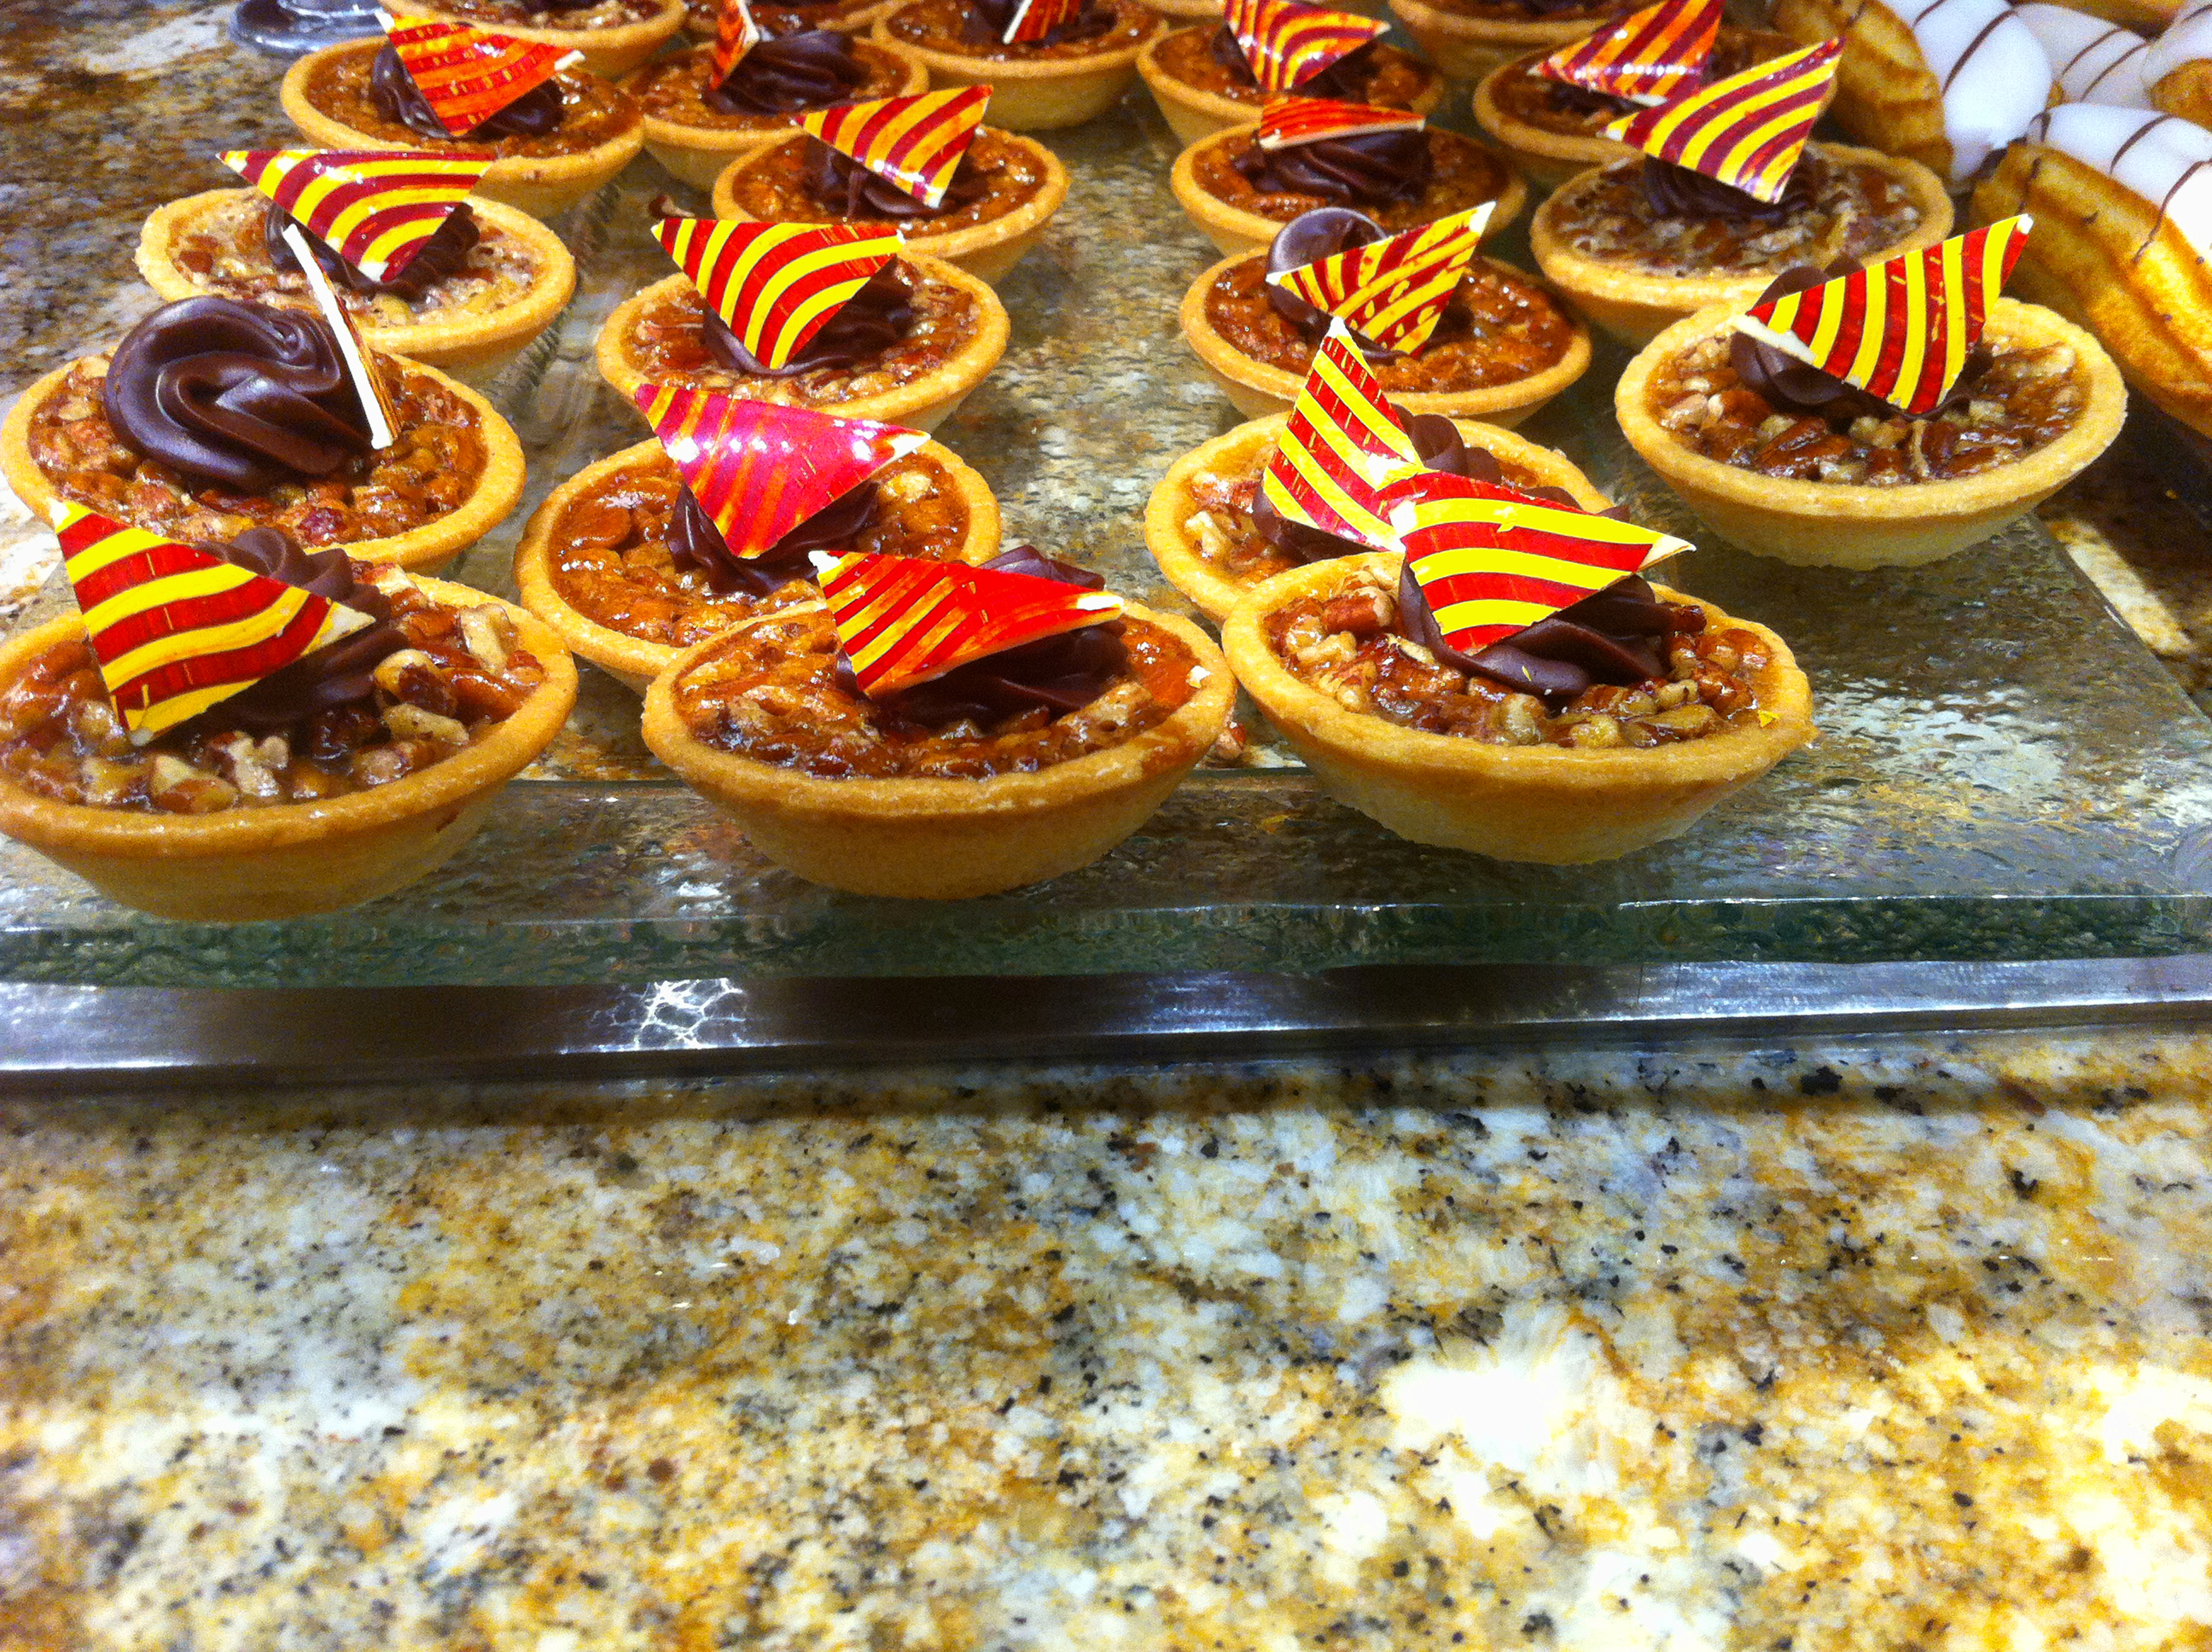 Miraculous Pecan Pies At The Bellagio Las Vegas Flavorful Download Free Architecture Designs Intelgarnamadebymaigaardcom